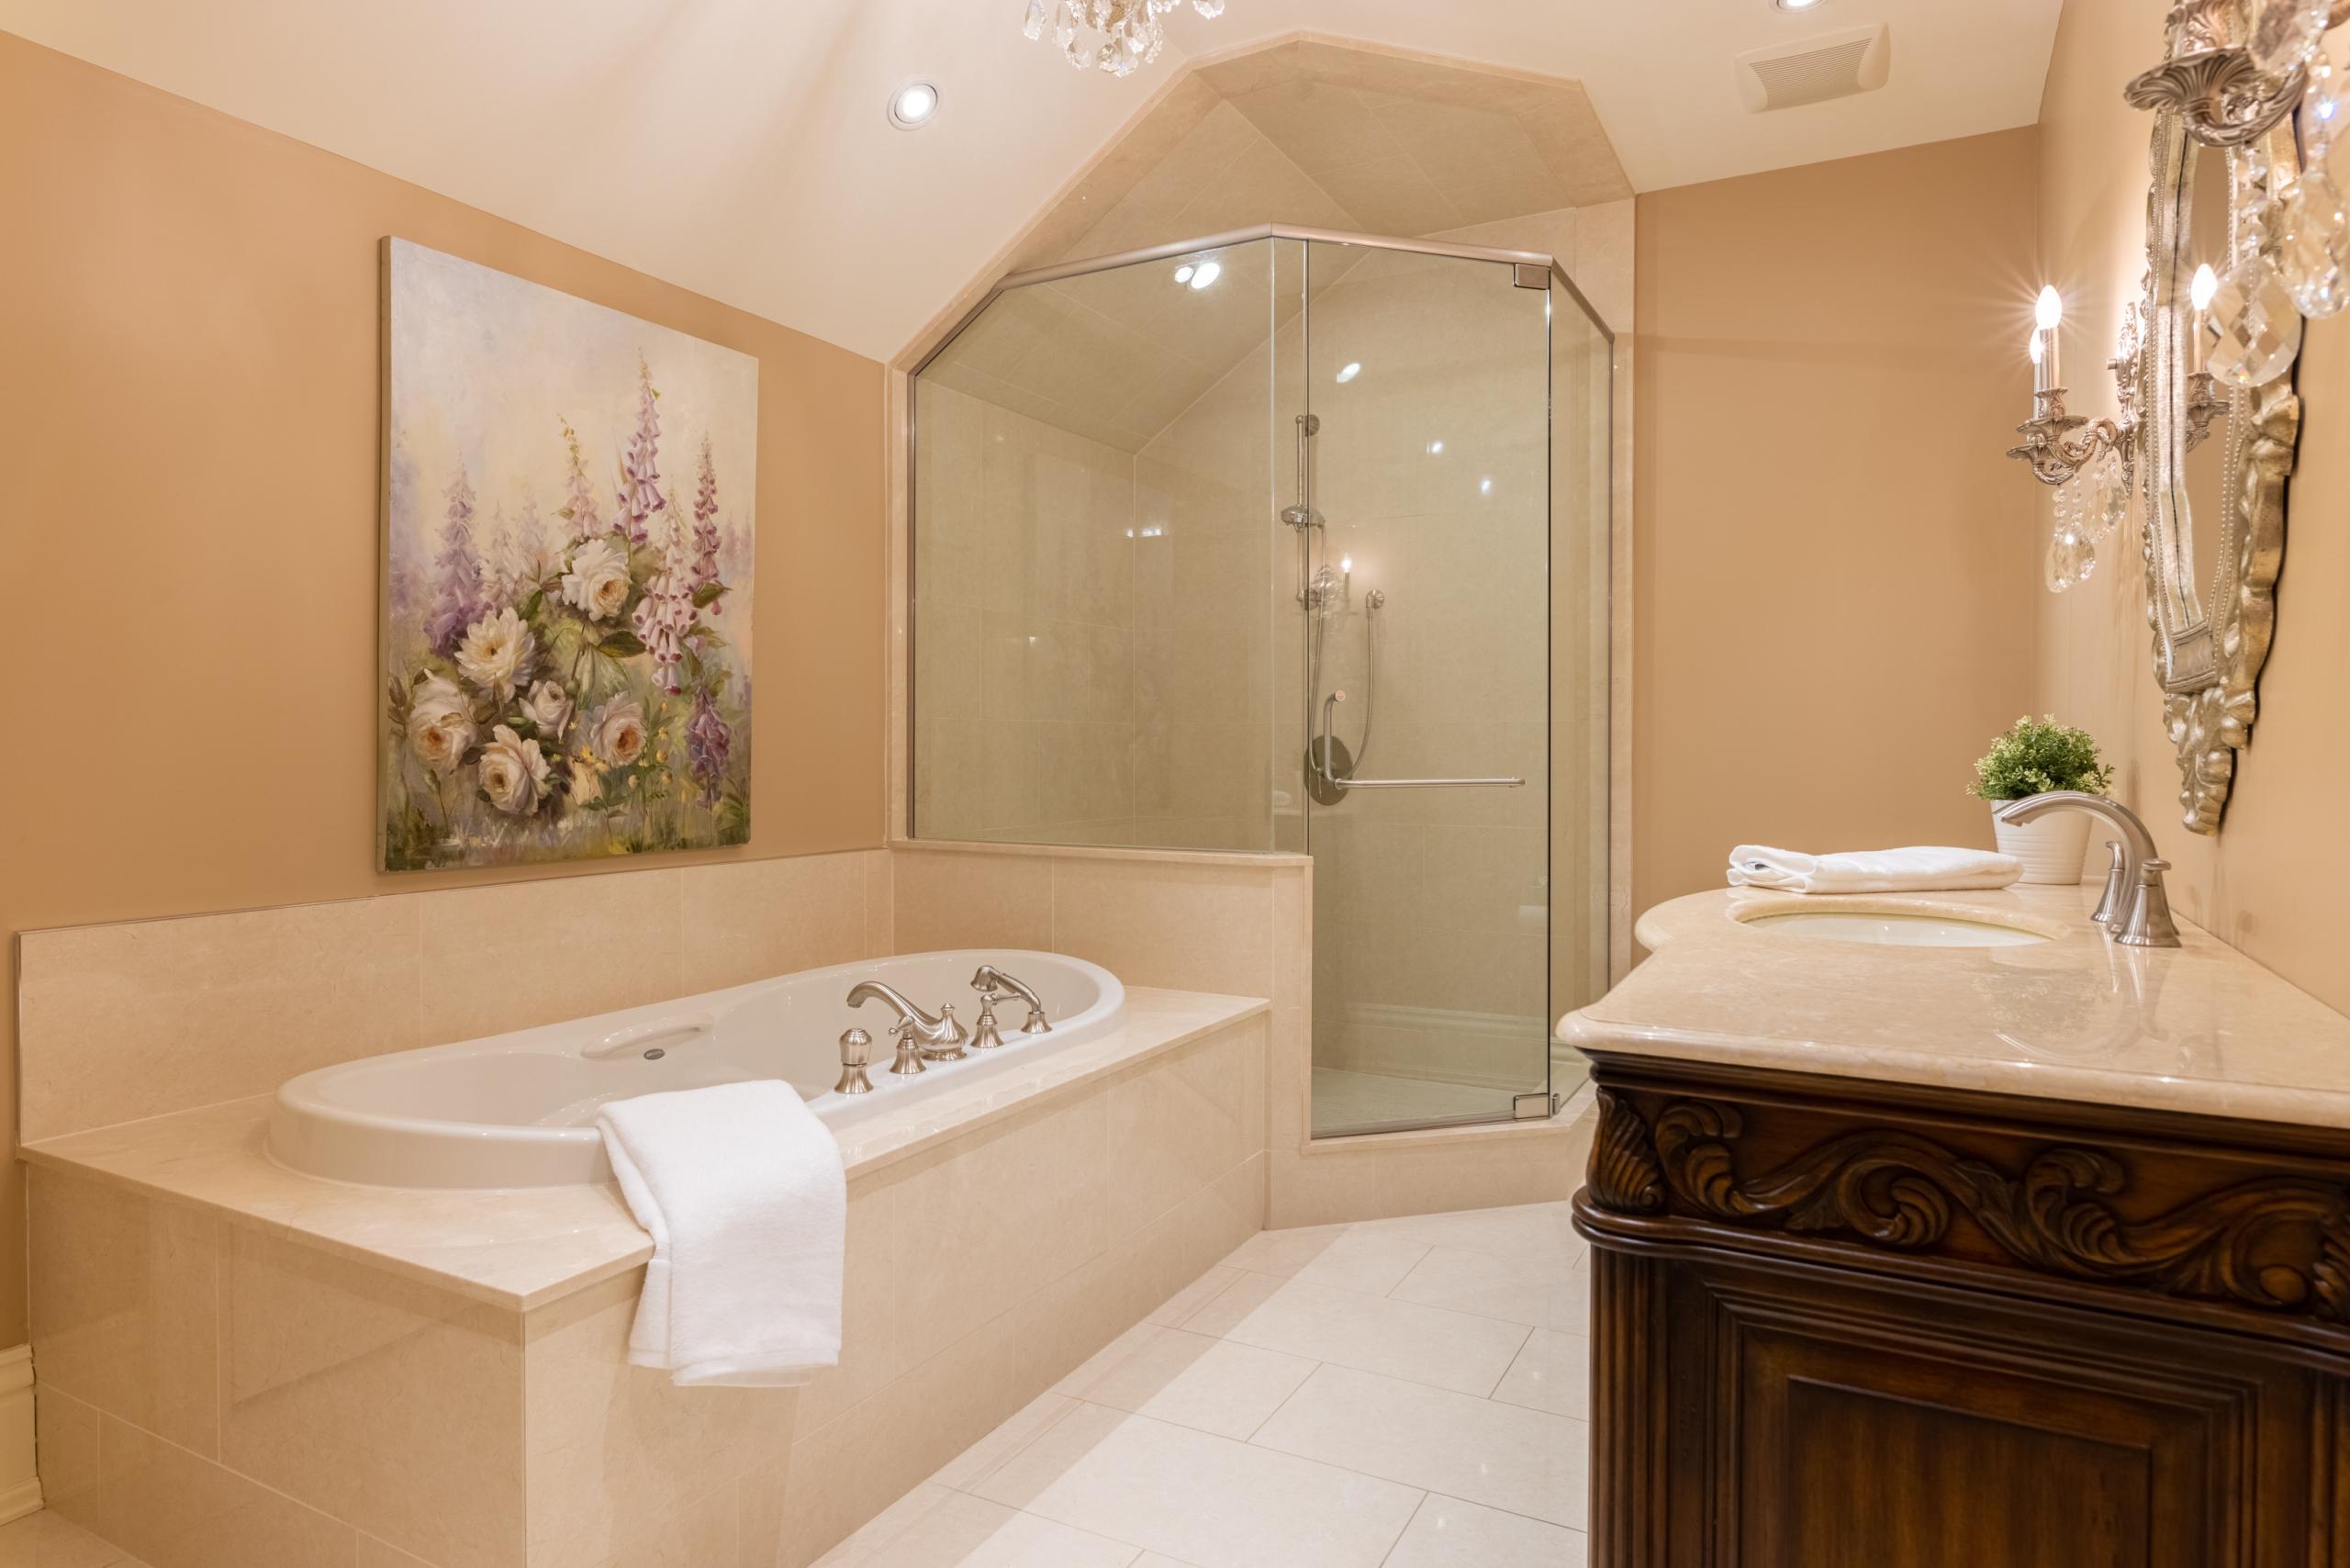 Bathroom featured at 2594 Bluffs Way, Burlington, ON at Alex Irish & Associates